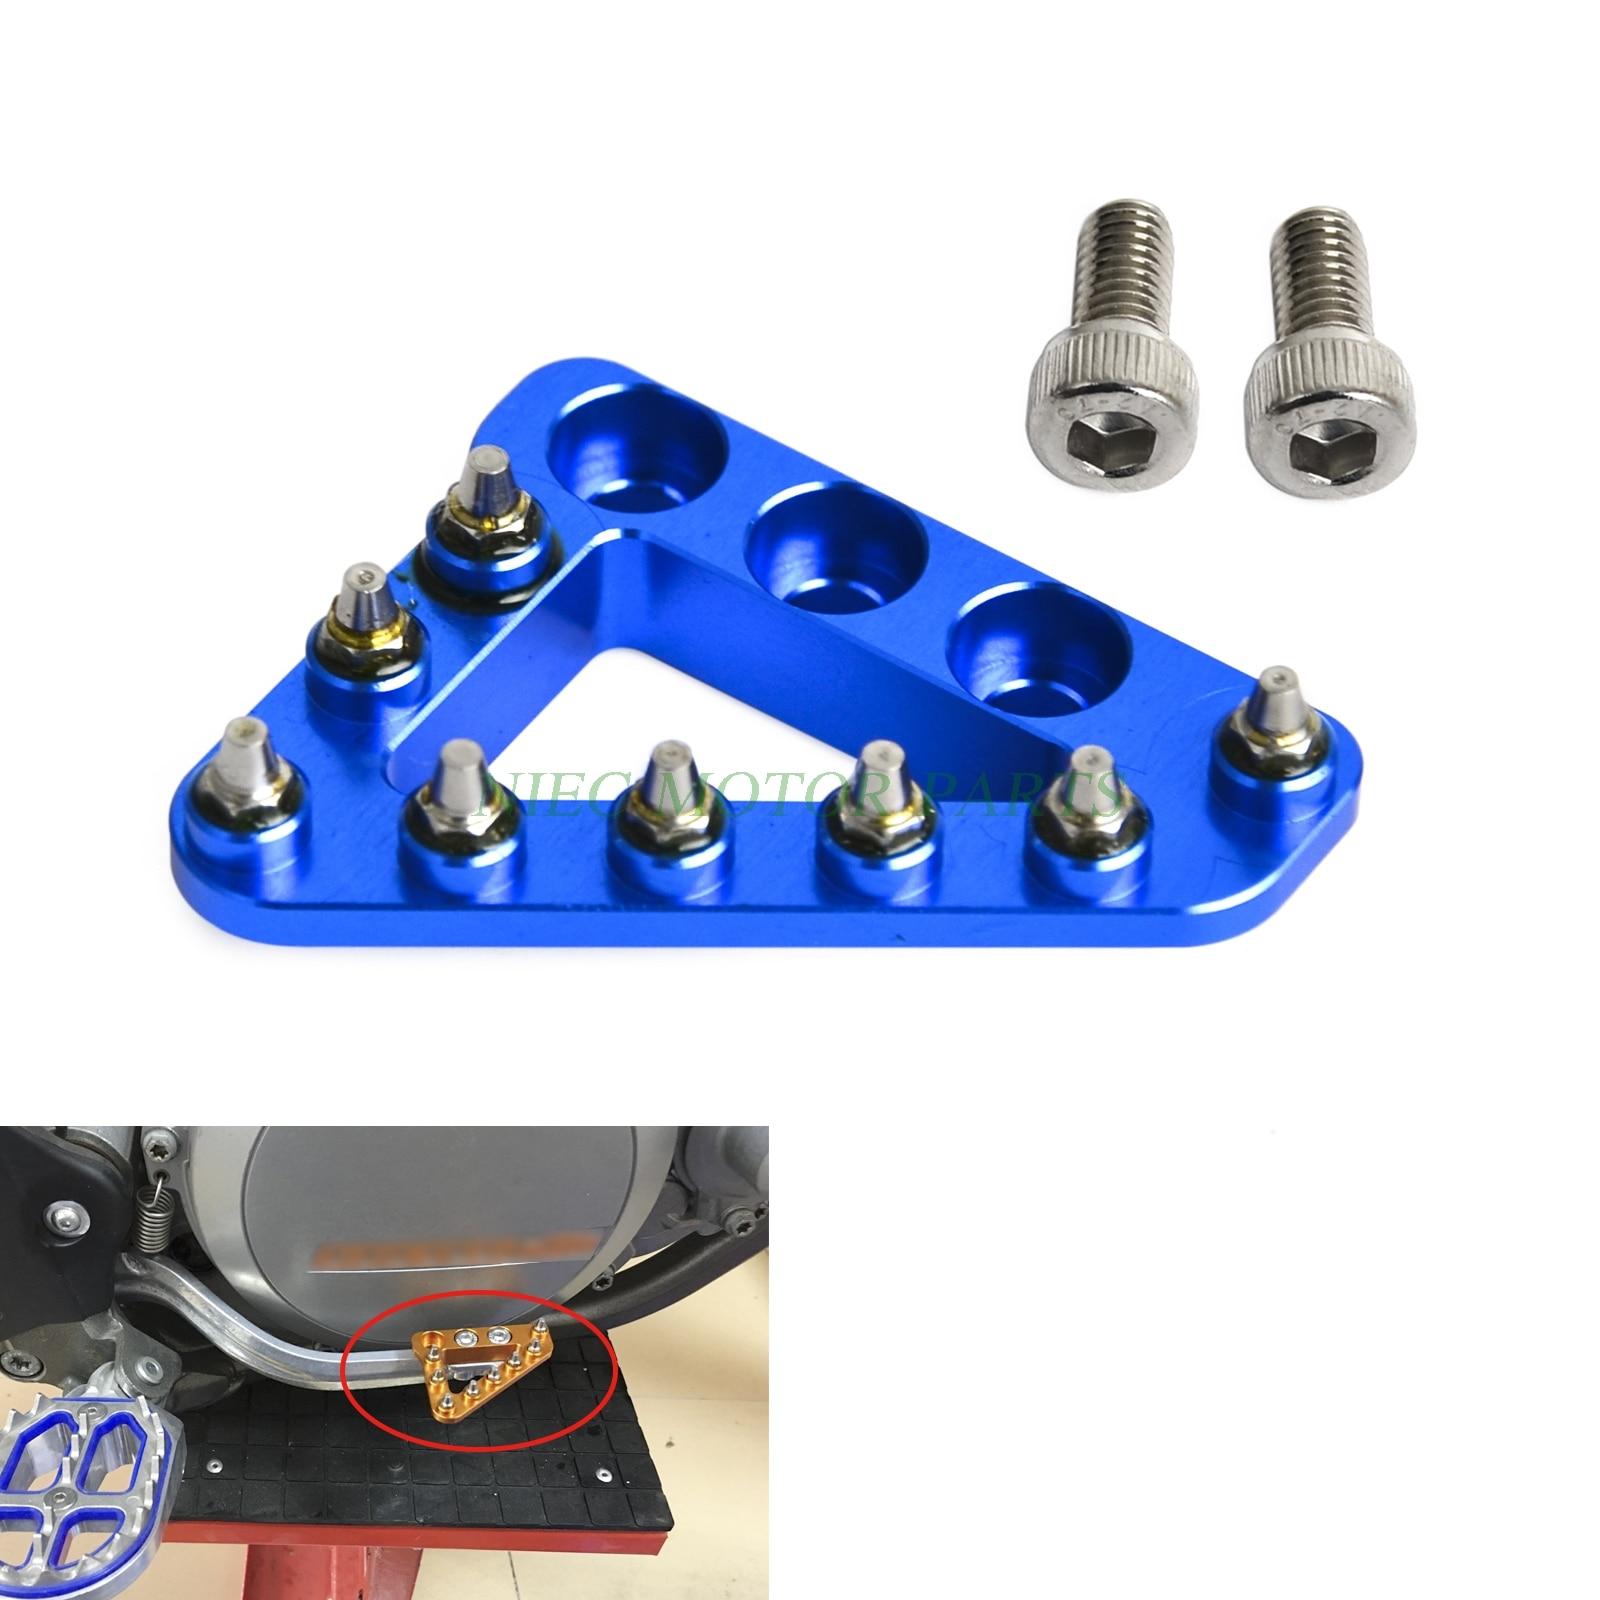 Motorcycle Oil Filler Cap Plug For Husqvarna FC FE 125 150 300 250 300 450